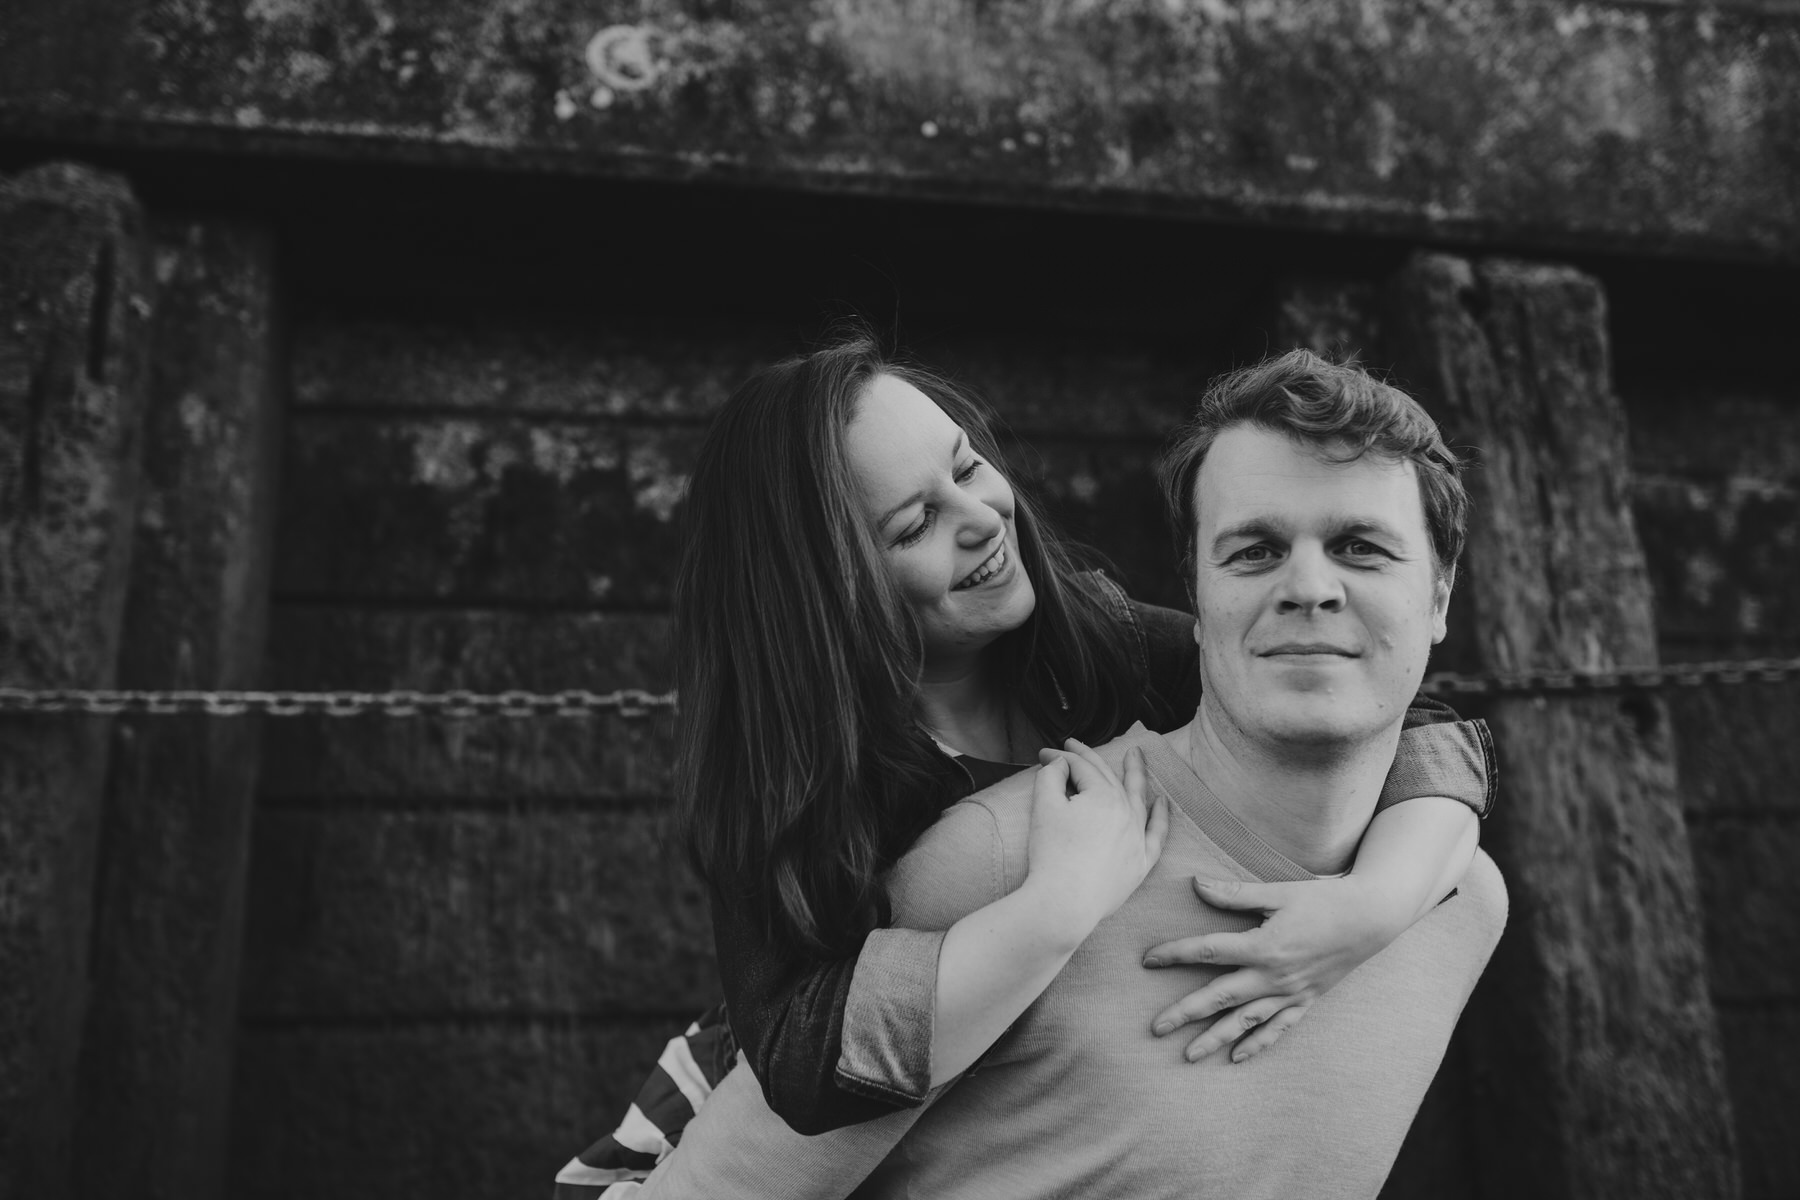 23-Quirky-engagement-London-piggy-back-couple-pose.jpg